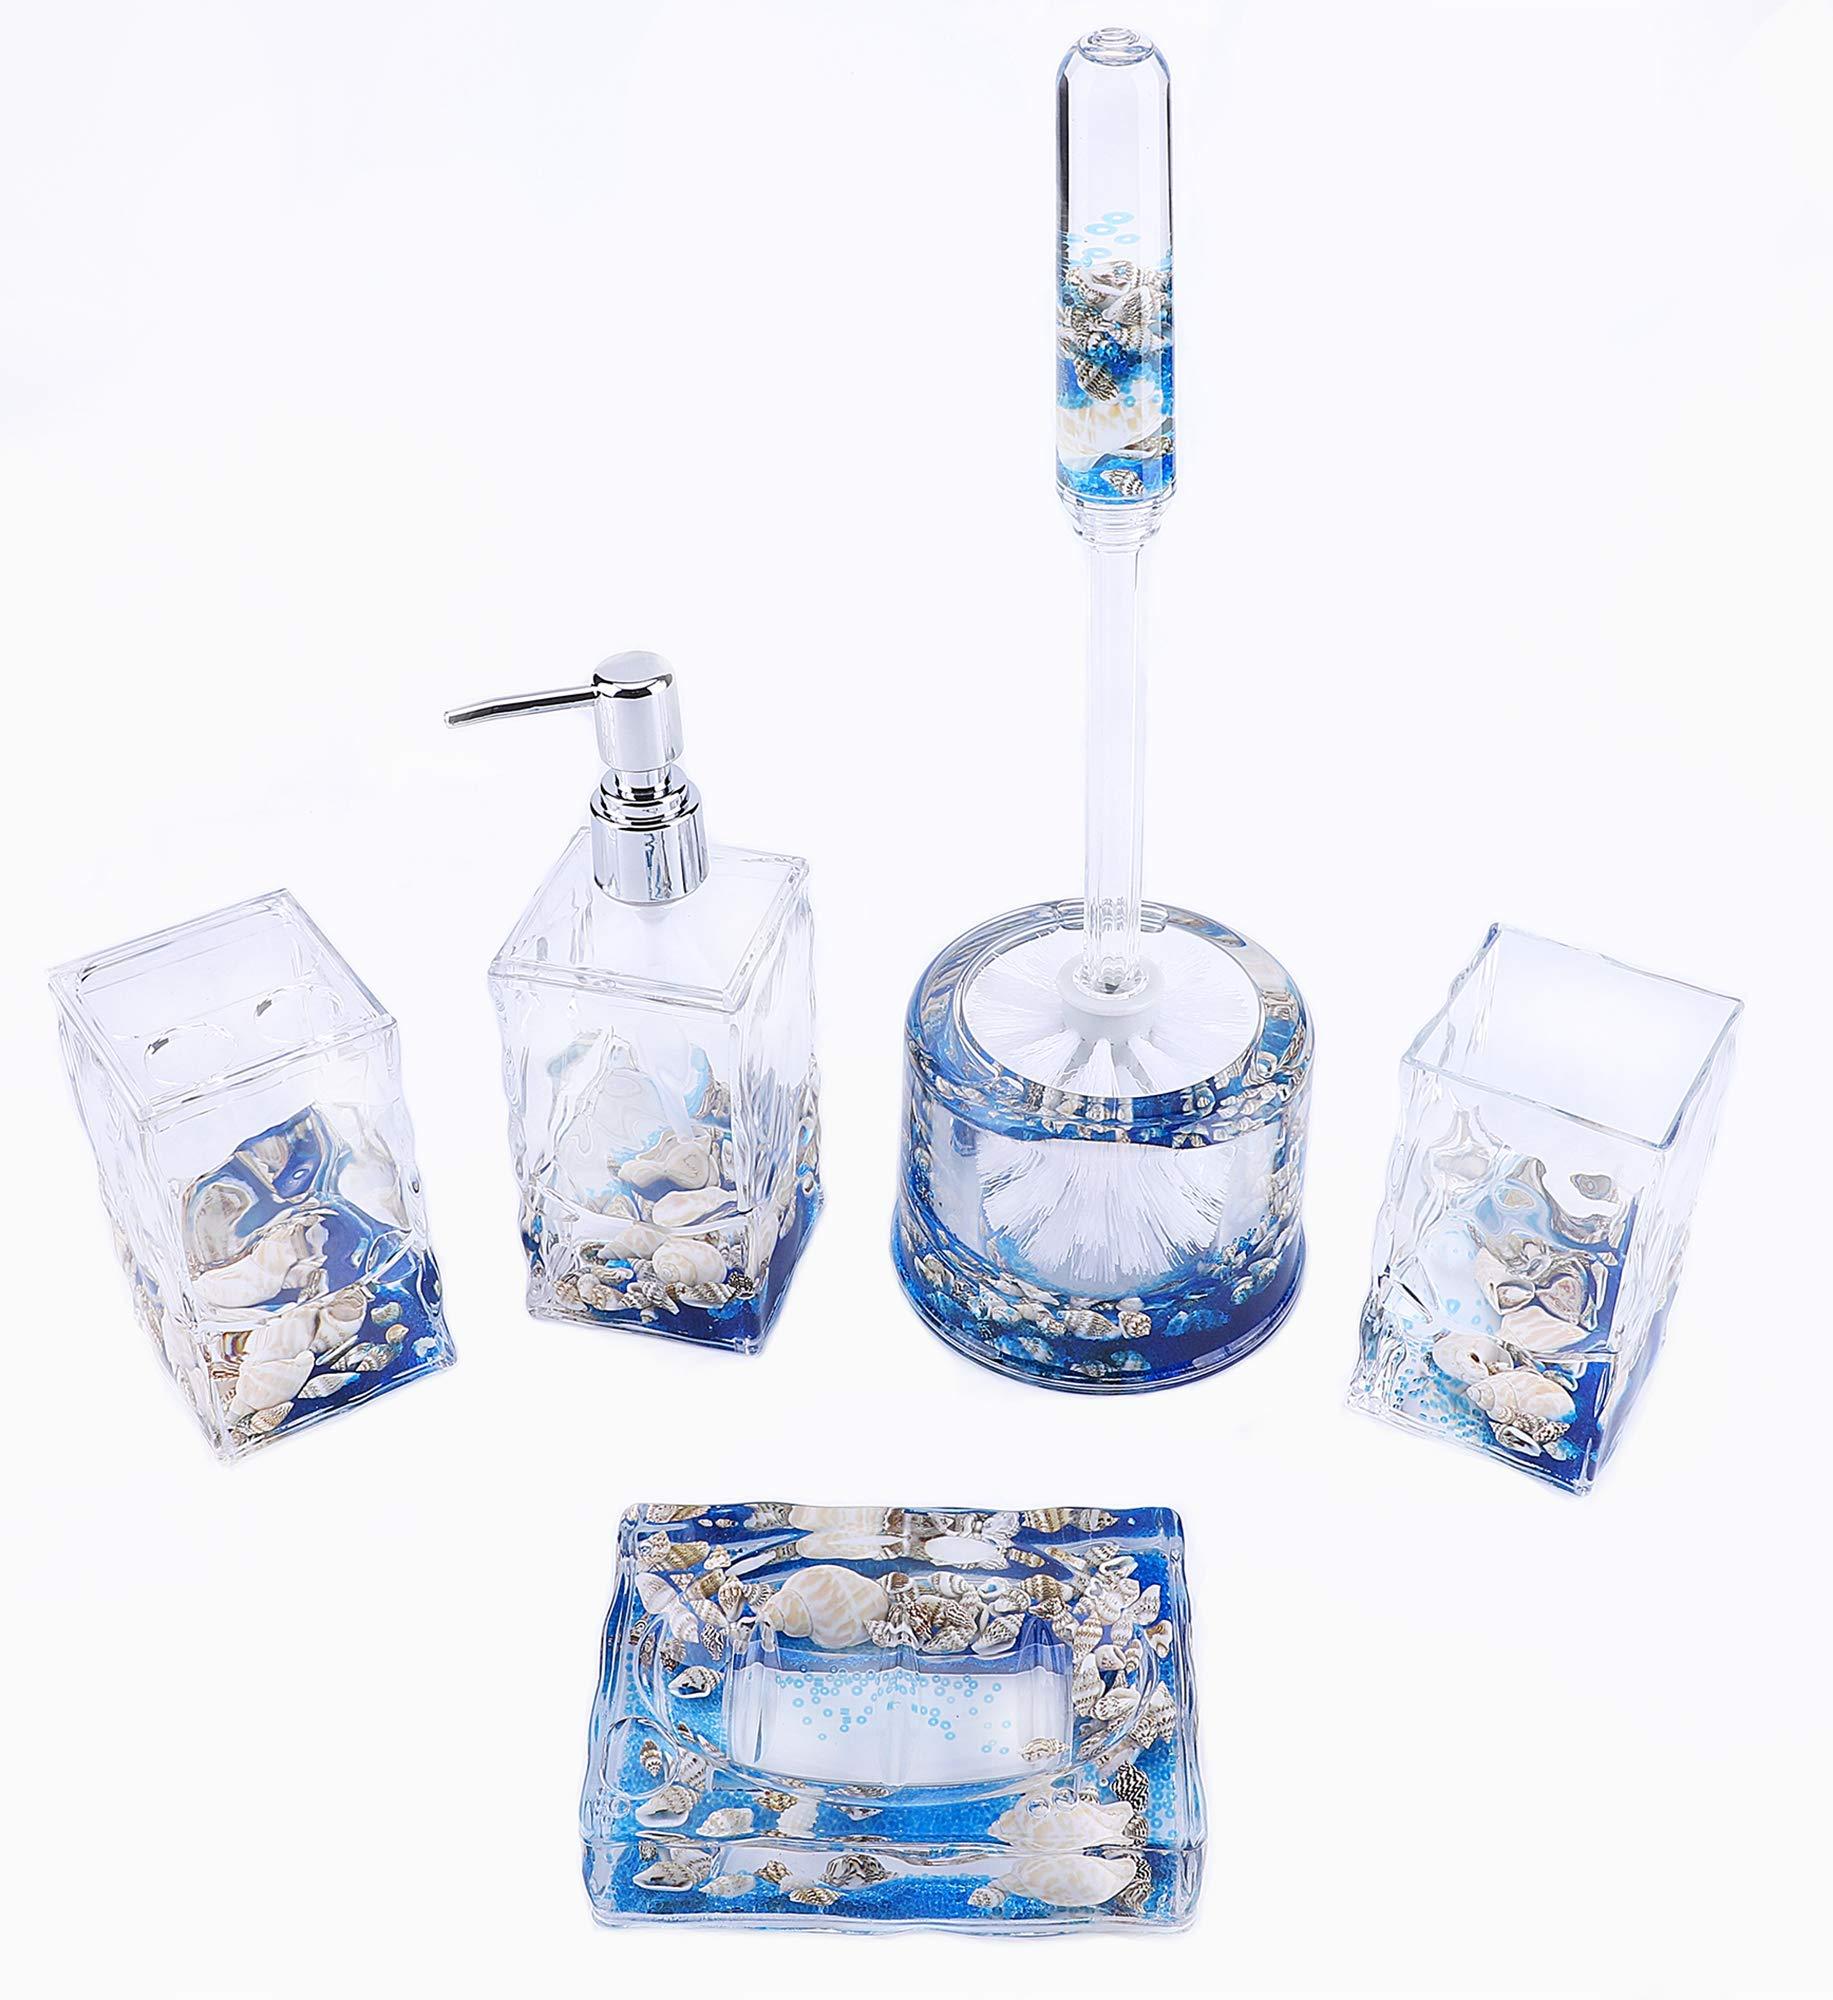 Yeti Decor 5 Piece Acrylic Liquid 3D Floating Motion Bathroom Vanity Accessory Set Shell